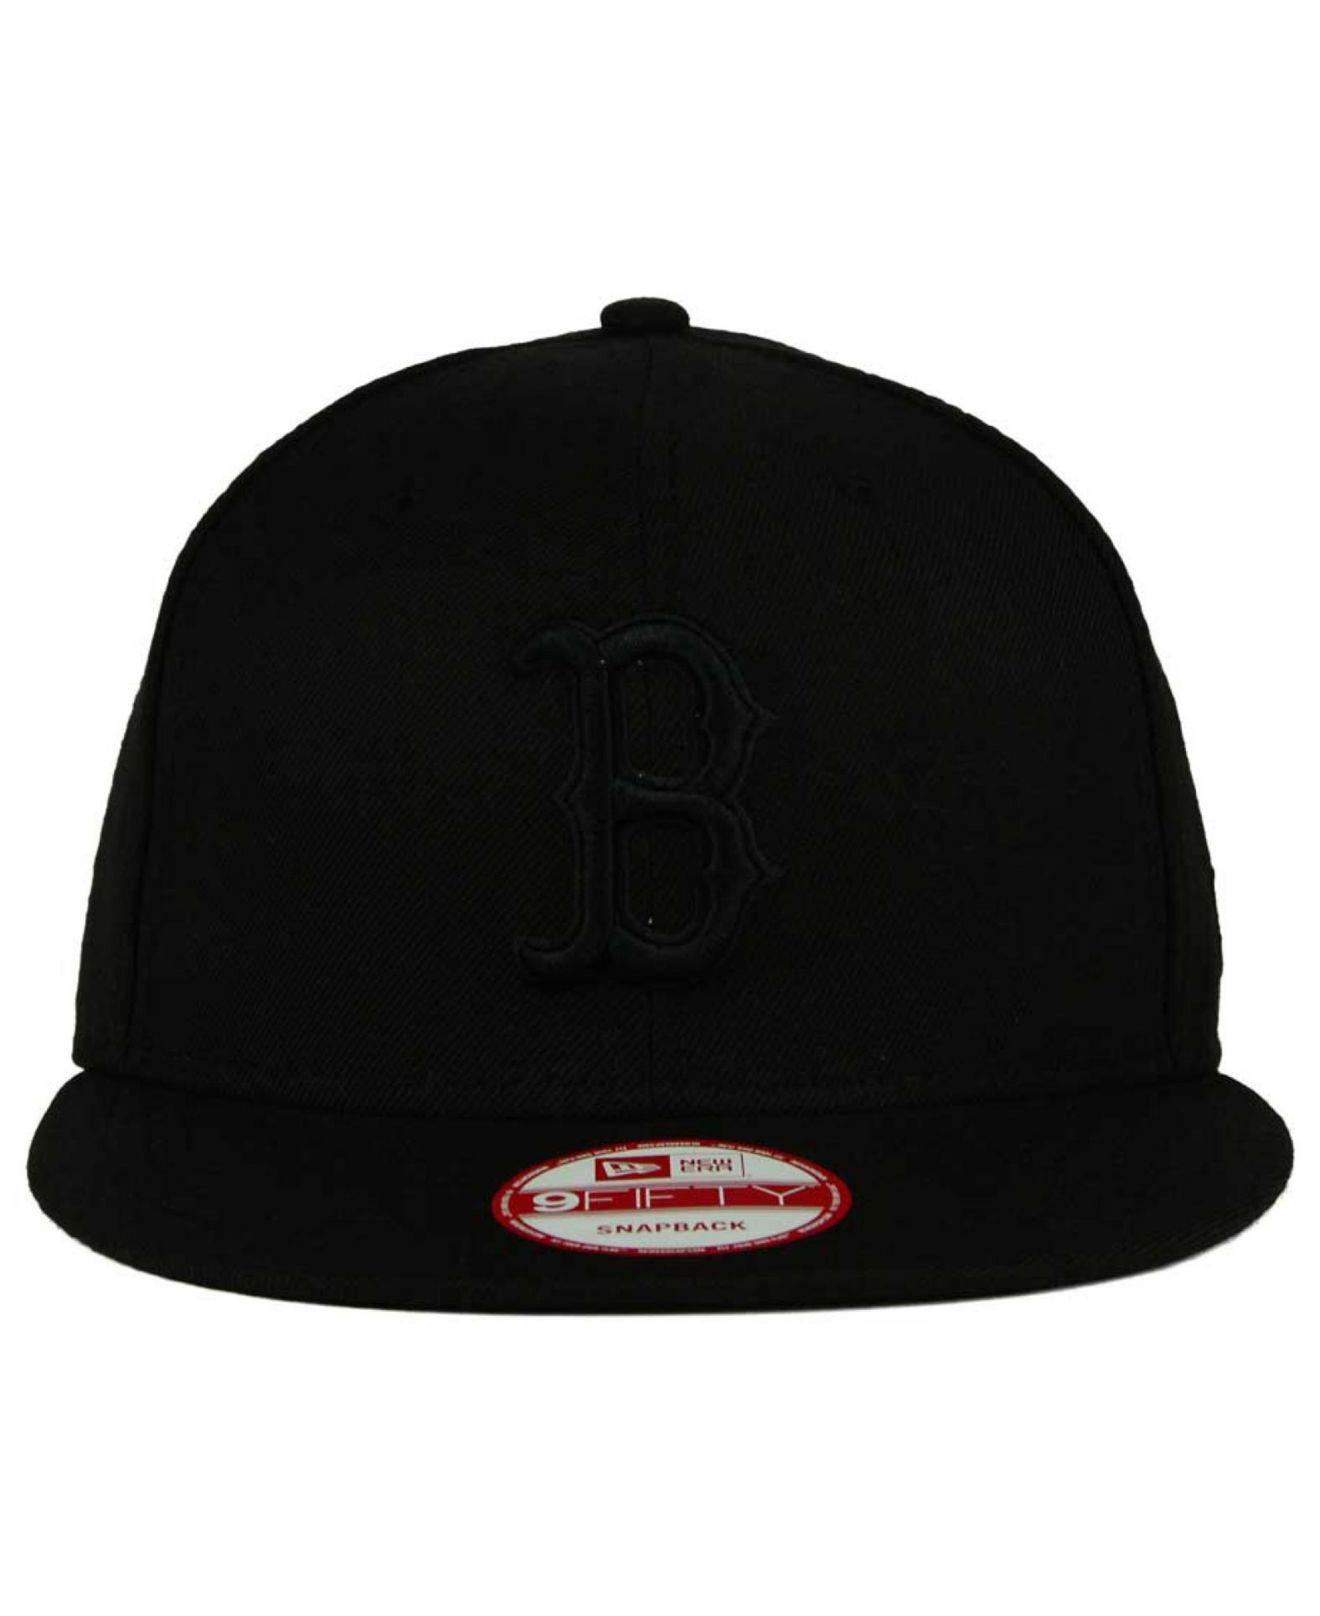 5561d40f877 Lyst - KTZ Boston Red Sox Black On Black 9fifty Snapback Cap in Black for  Men